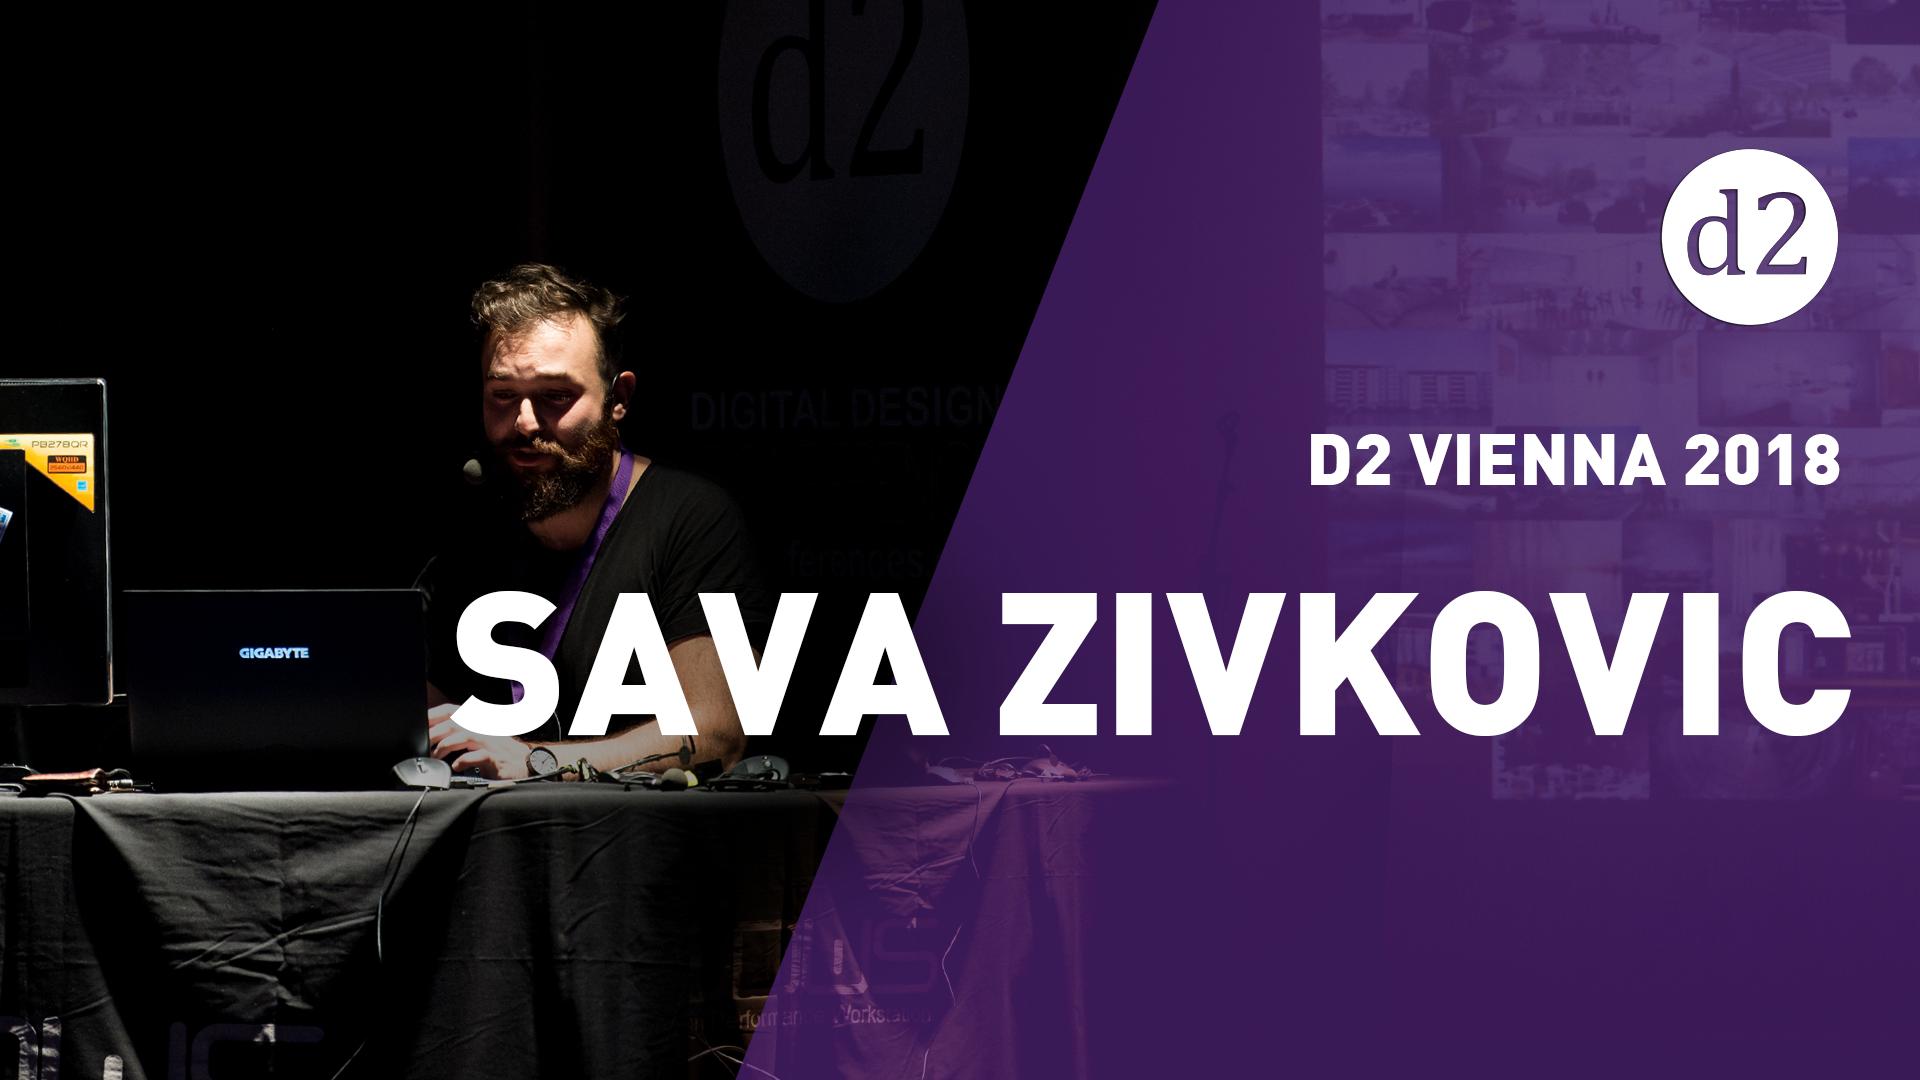 D2 Vienna 2018: Sava Zivkovic